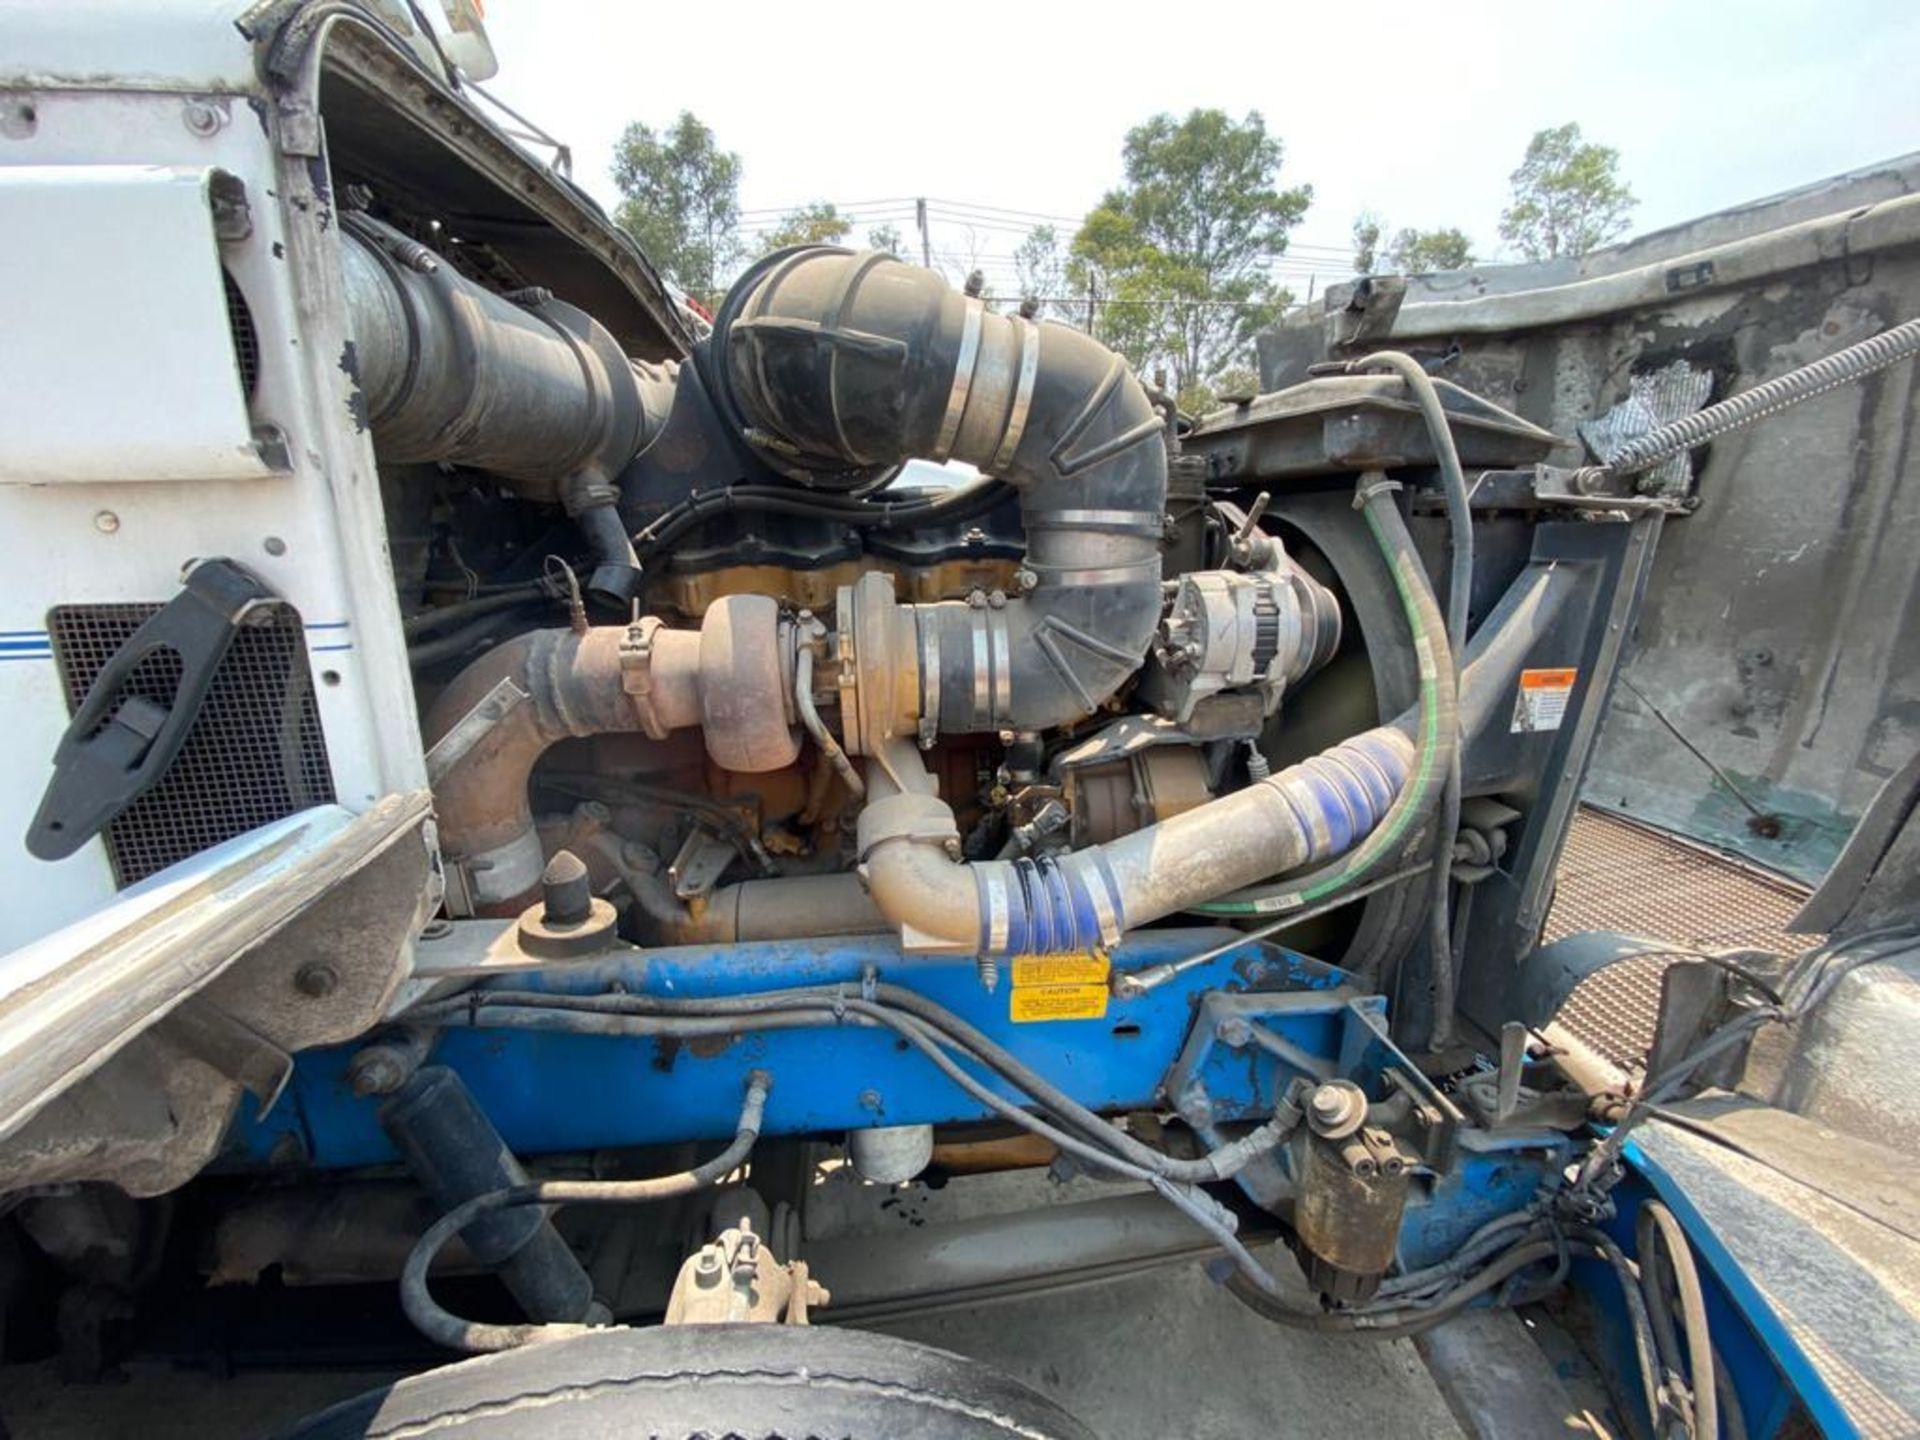 1999 Kenworth Sleeper truck tractor, standard transmission of 18 speeds - Image 65 of 70